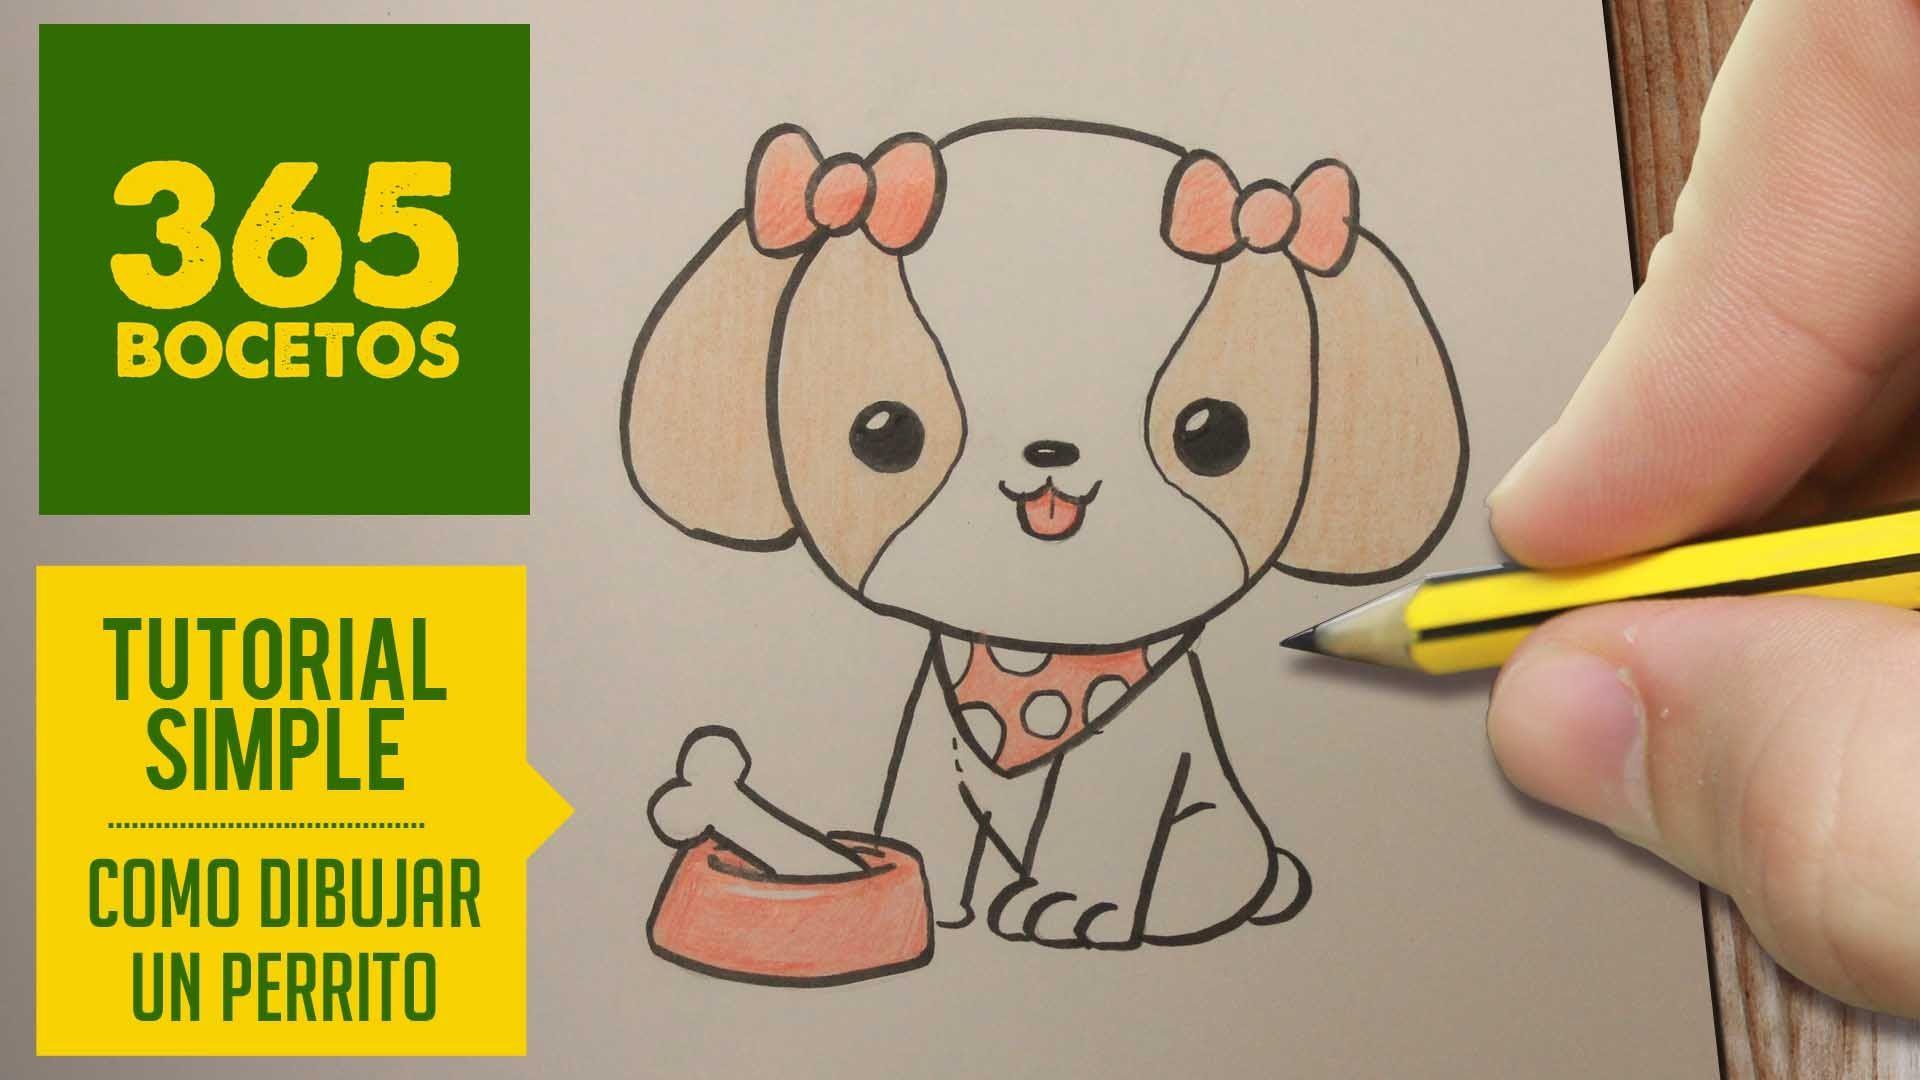 Imagenes De Perritos Faciles De Dibujar Para Fondo De Pantalla En